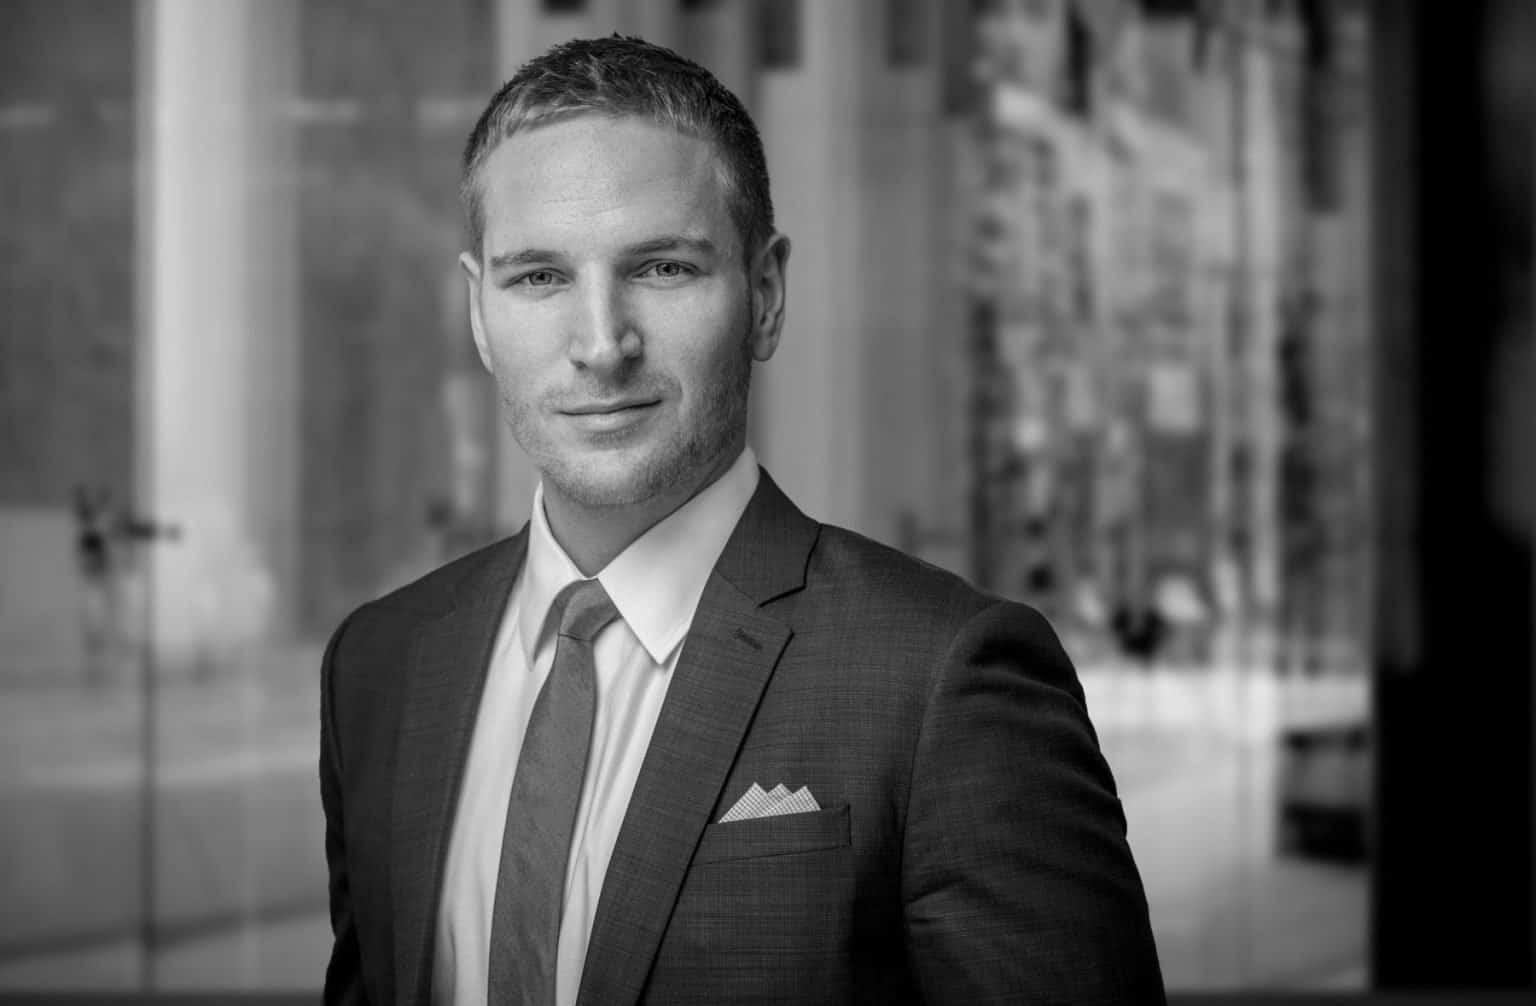 Professional LinkedIn Headshots Toronto